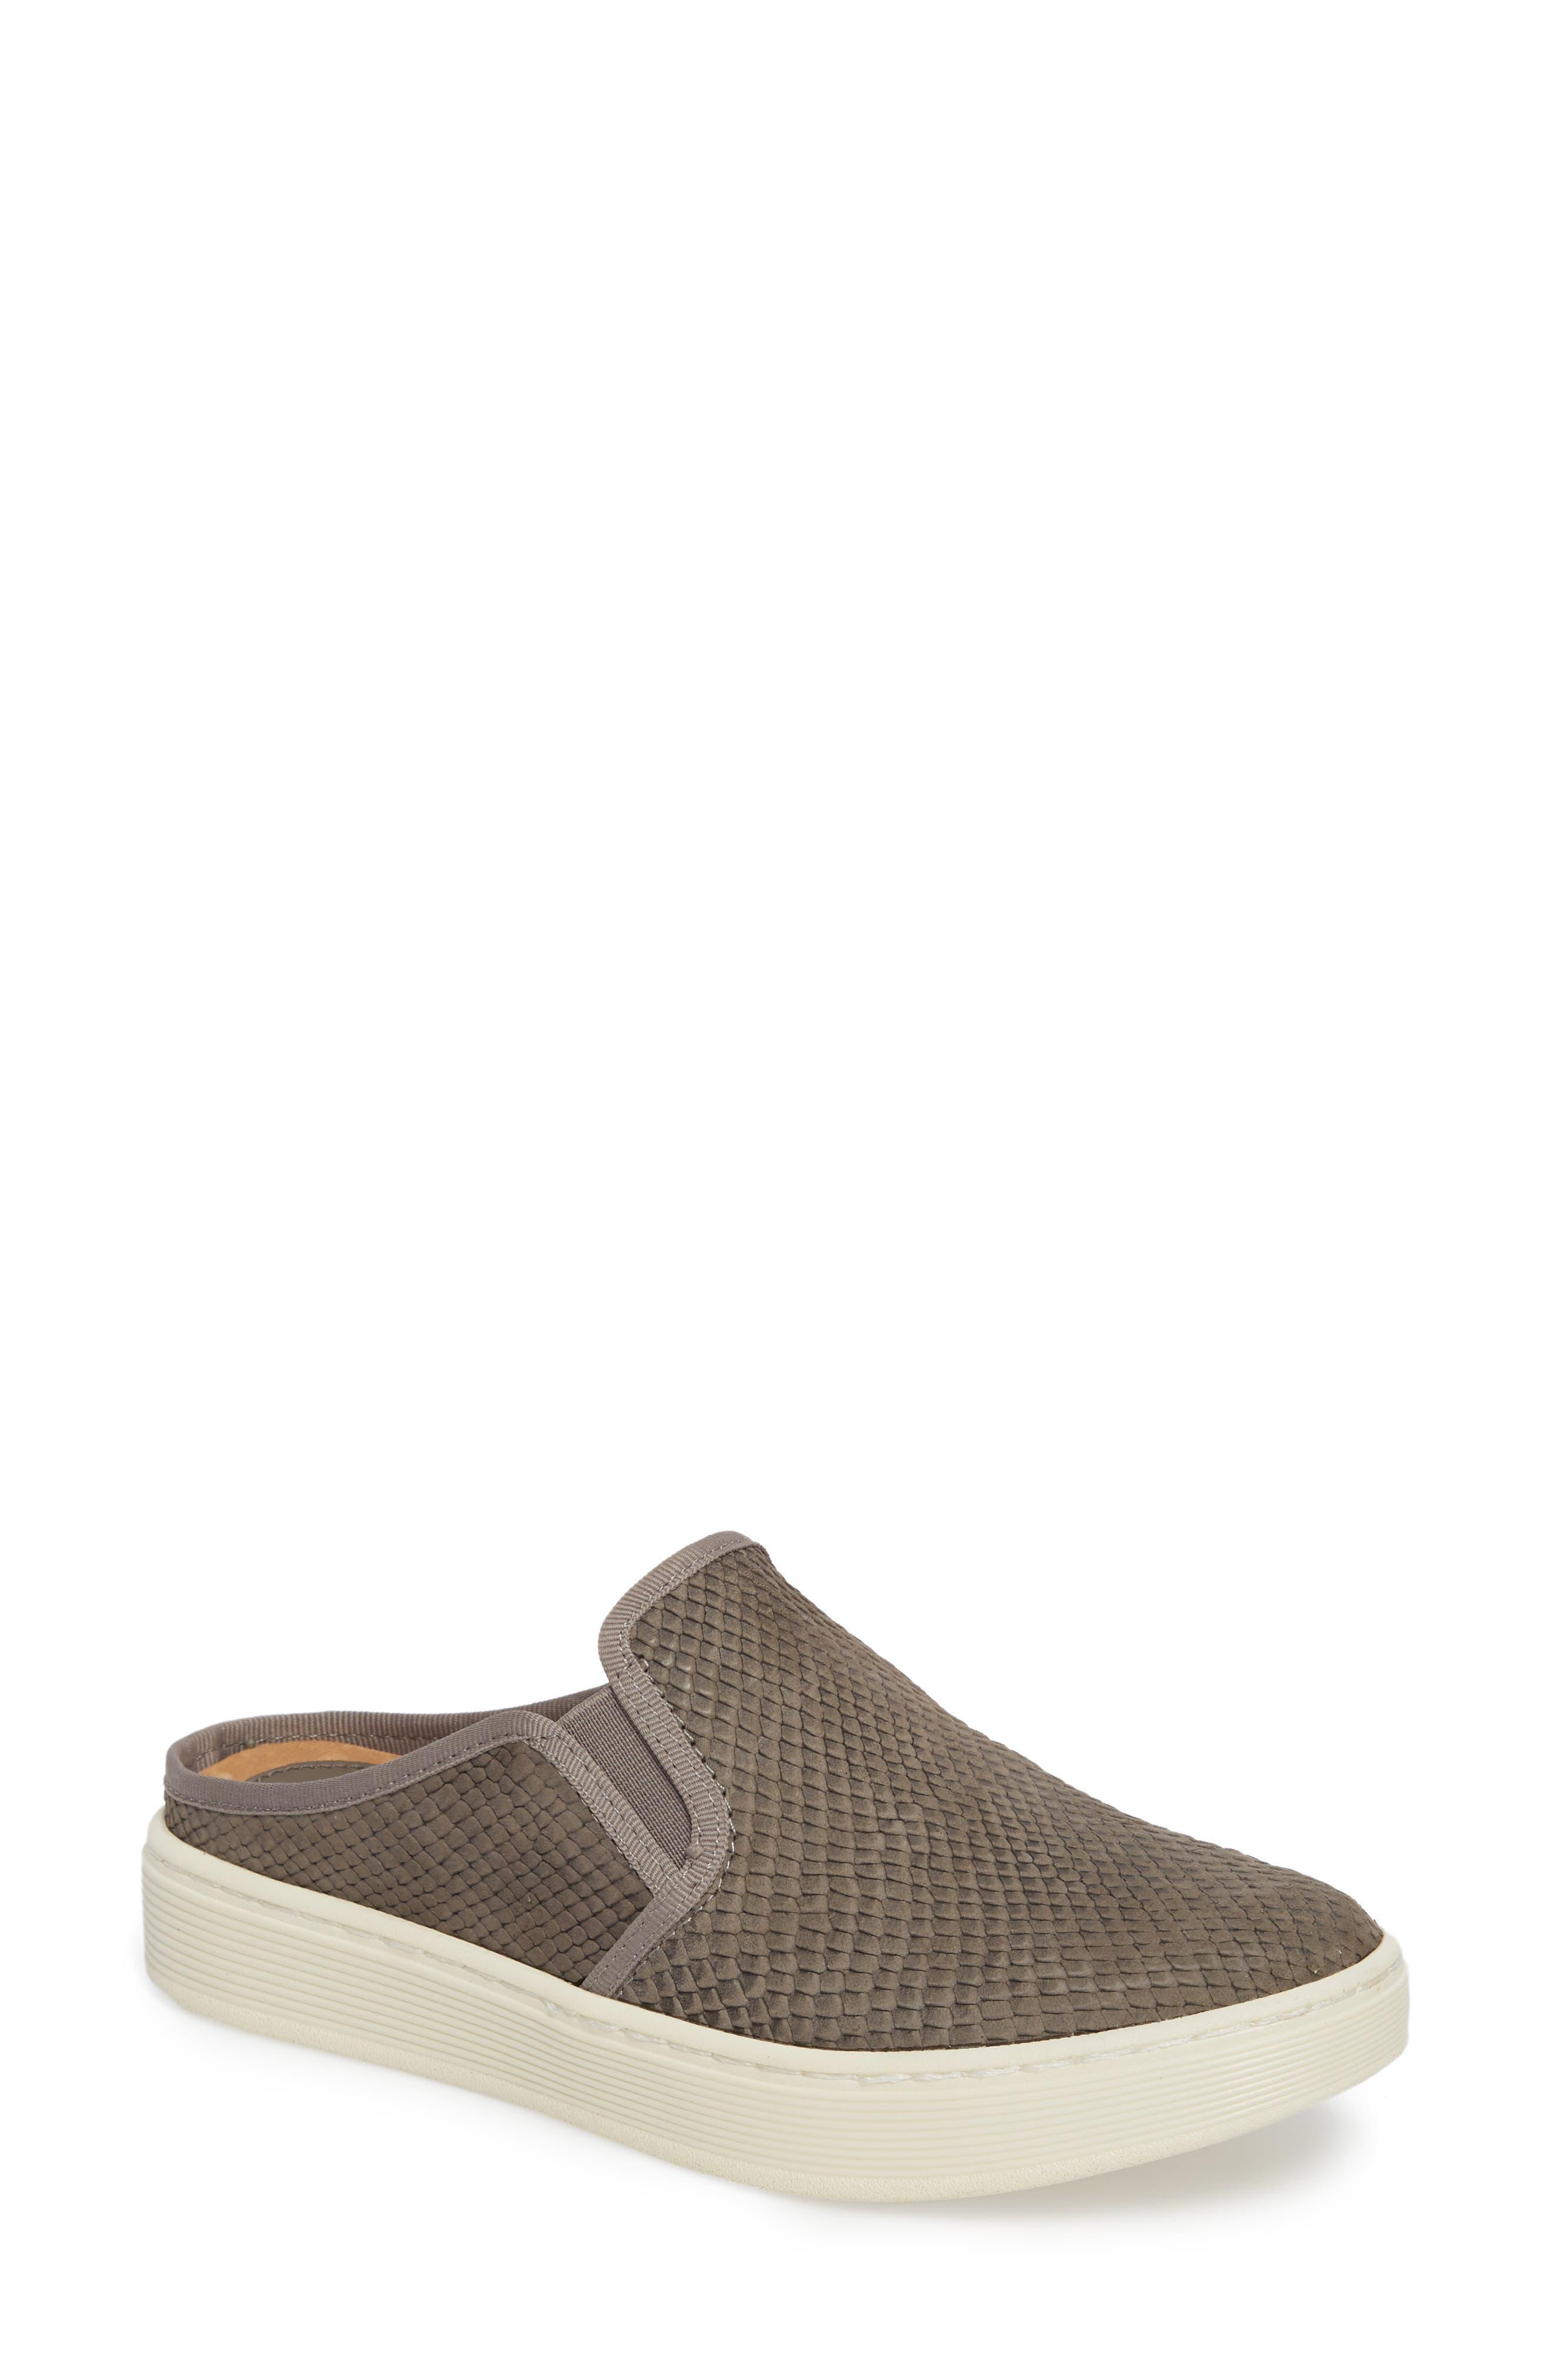 Söfft Somers Slip-On Sneaker (Women)